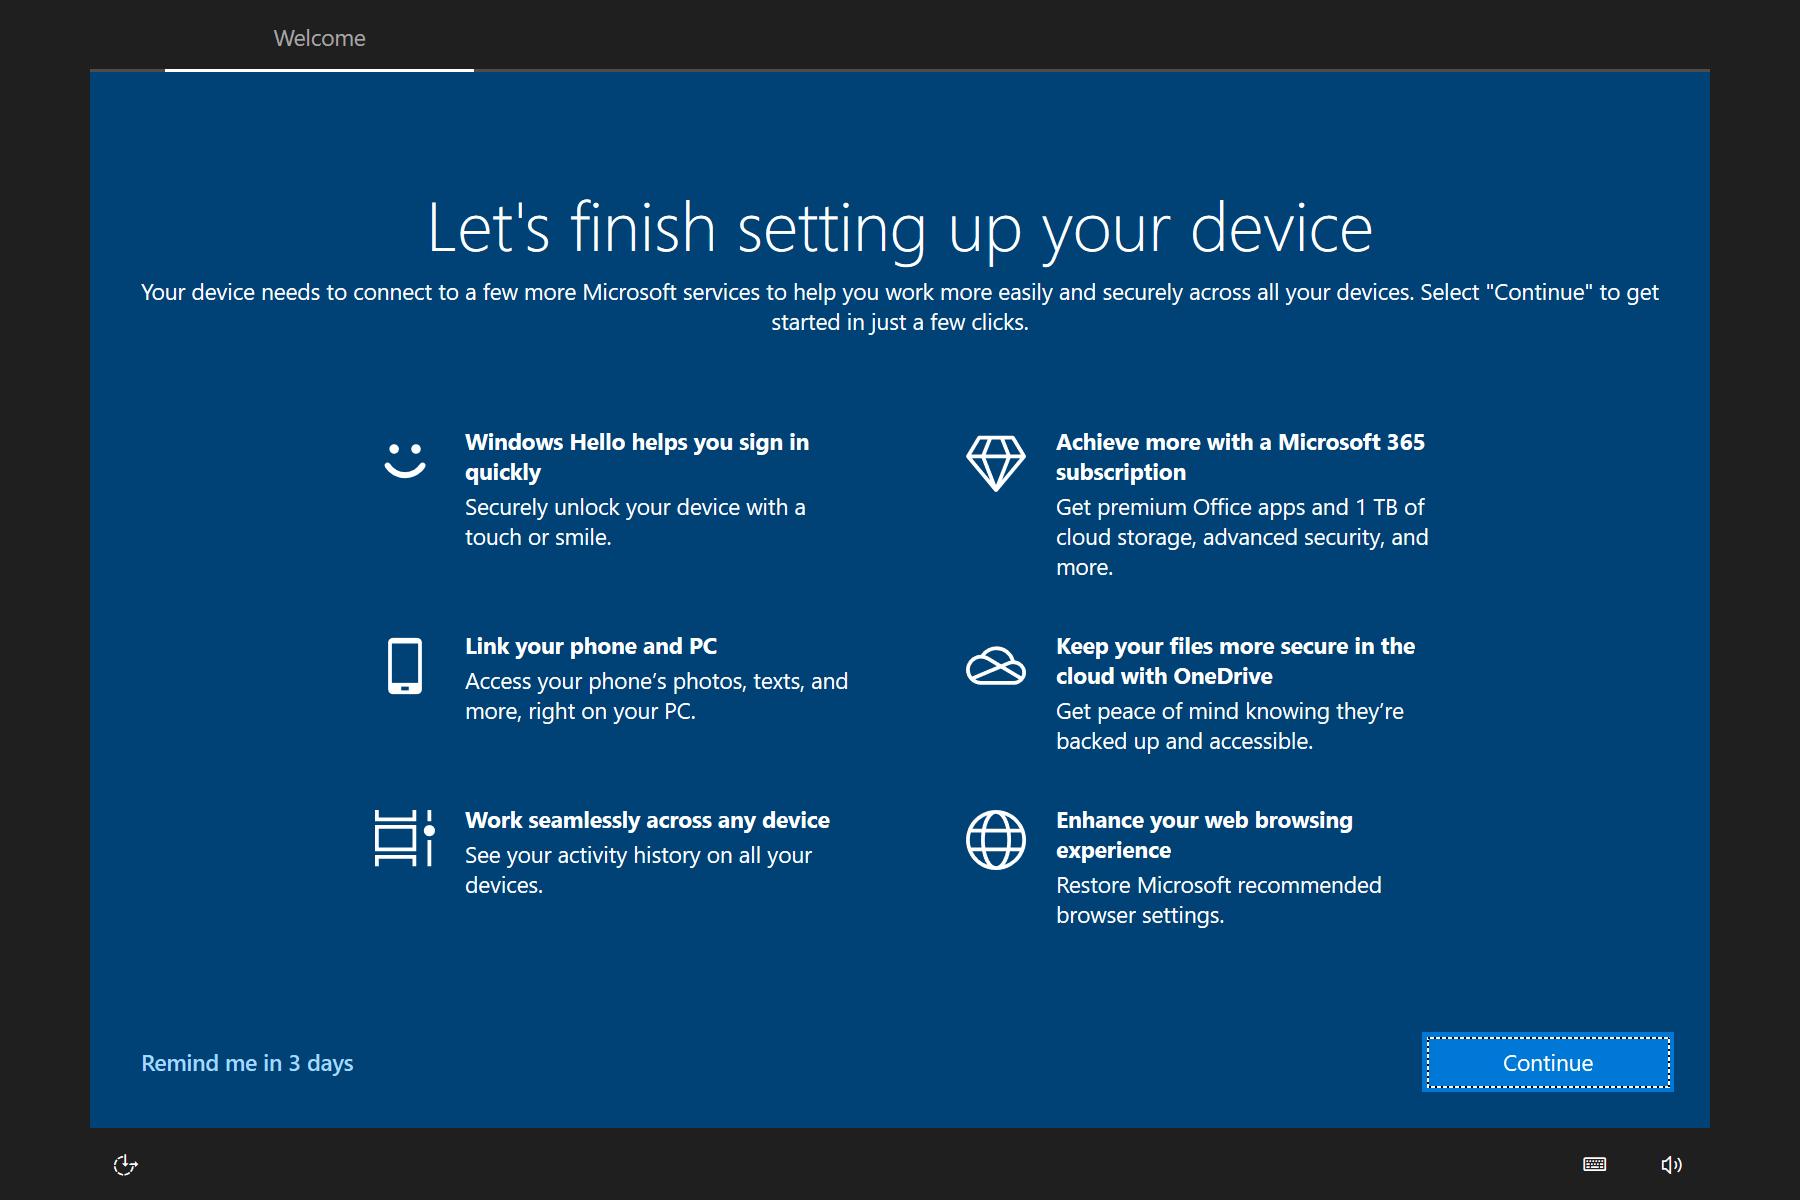 la experiencia de windows 10 out-of-box